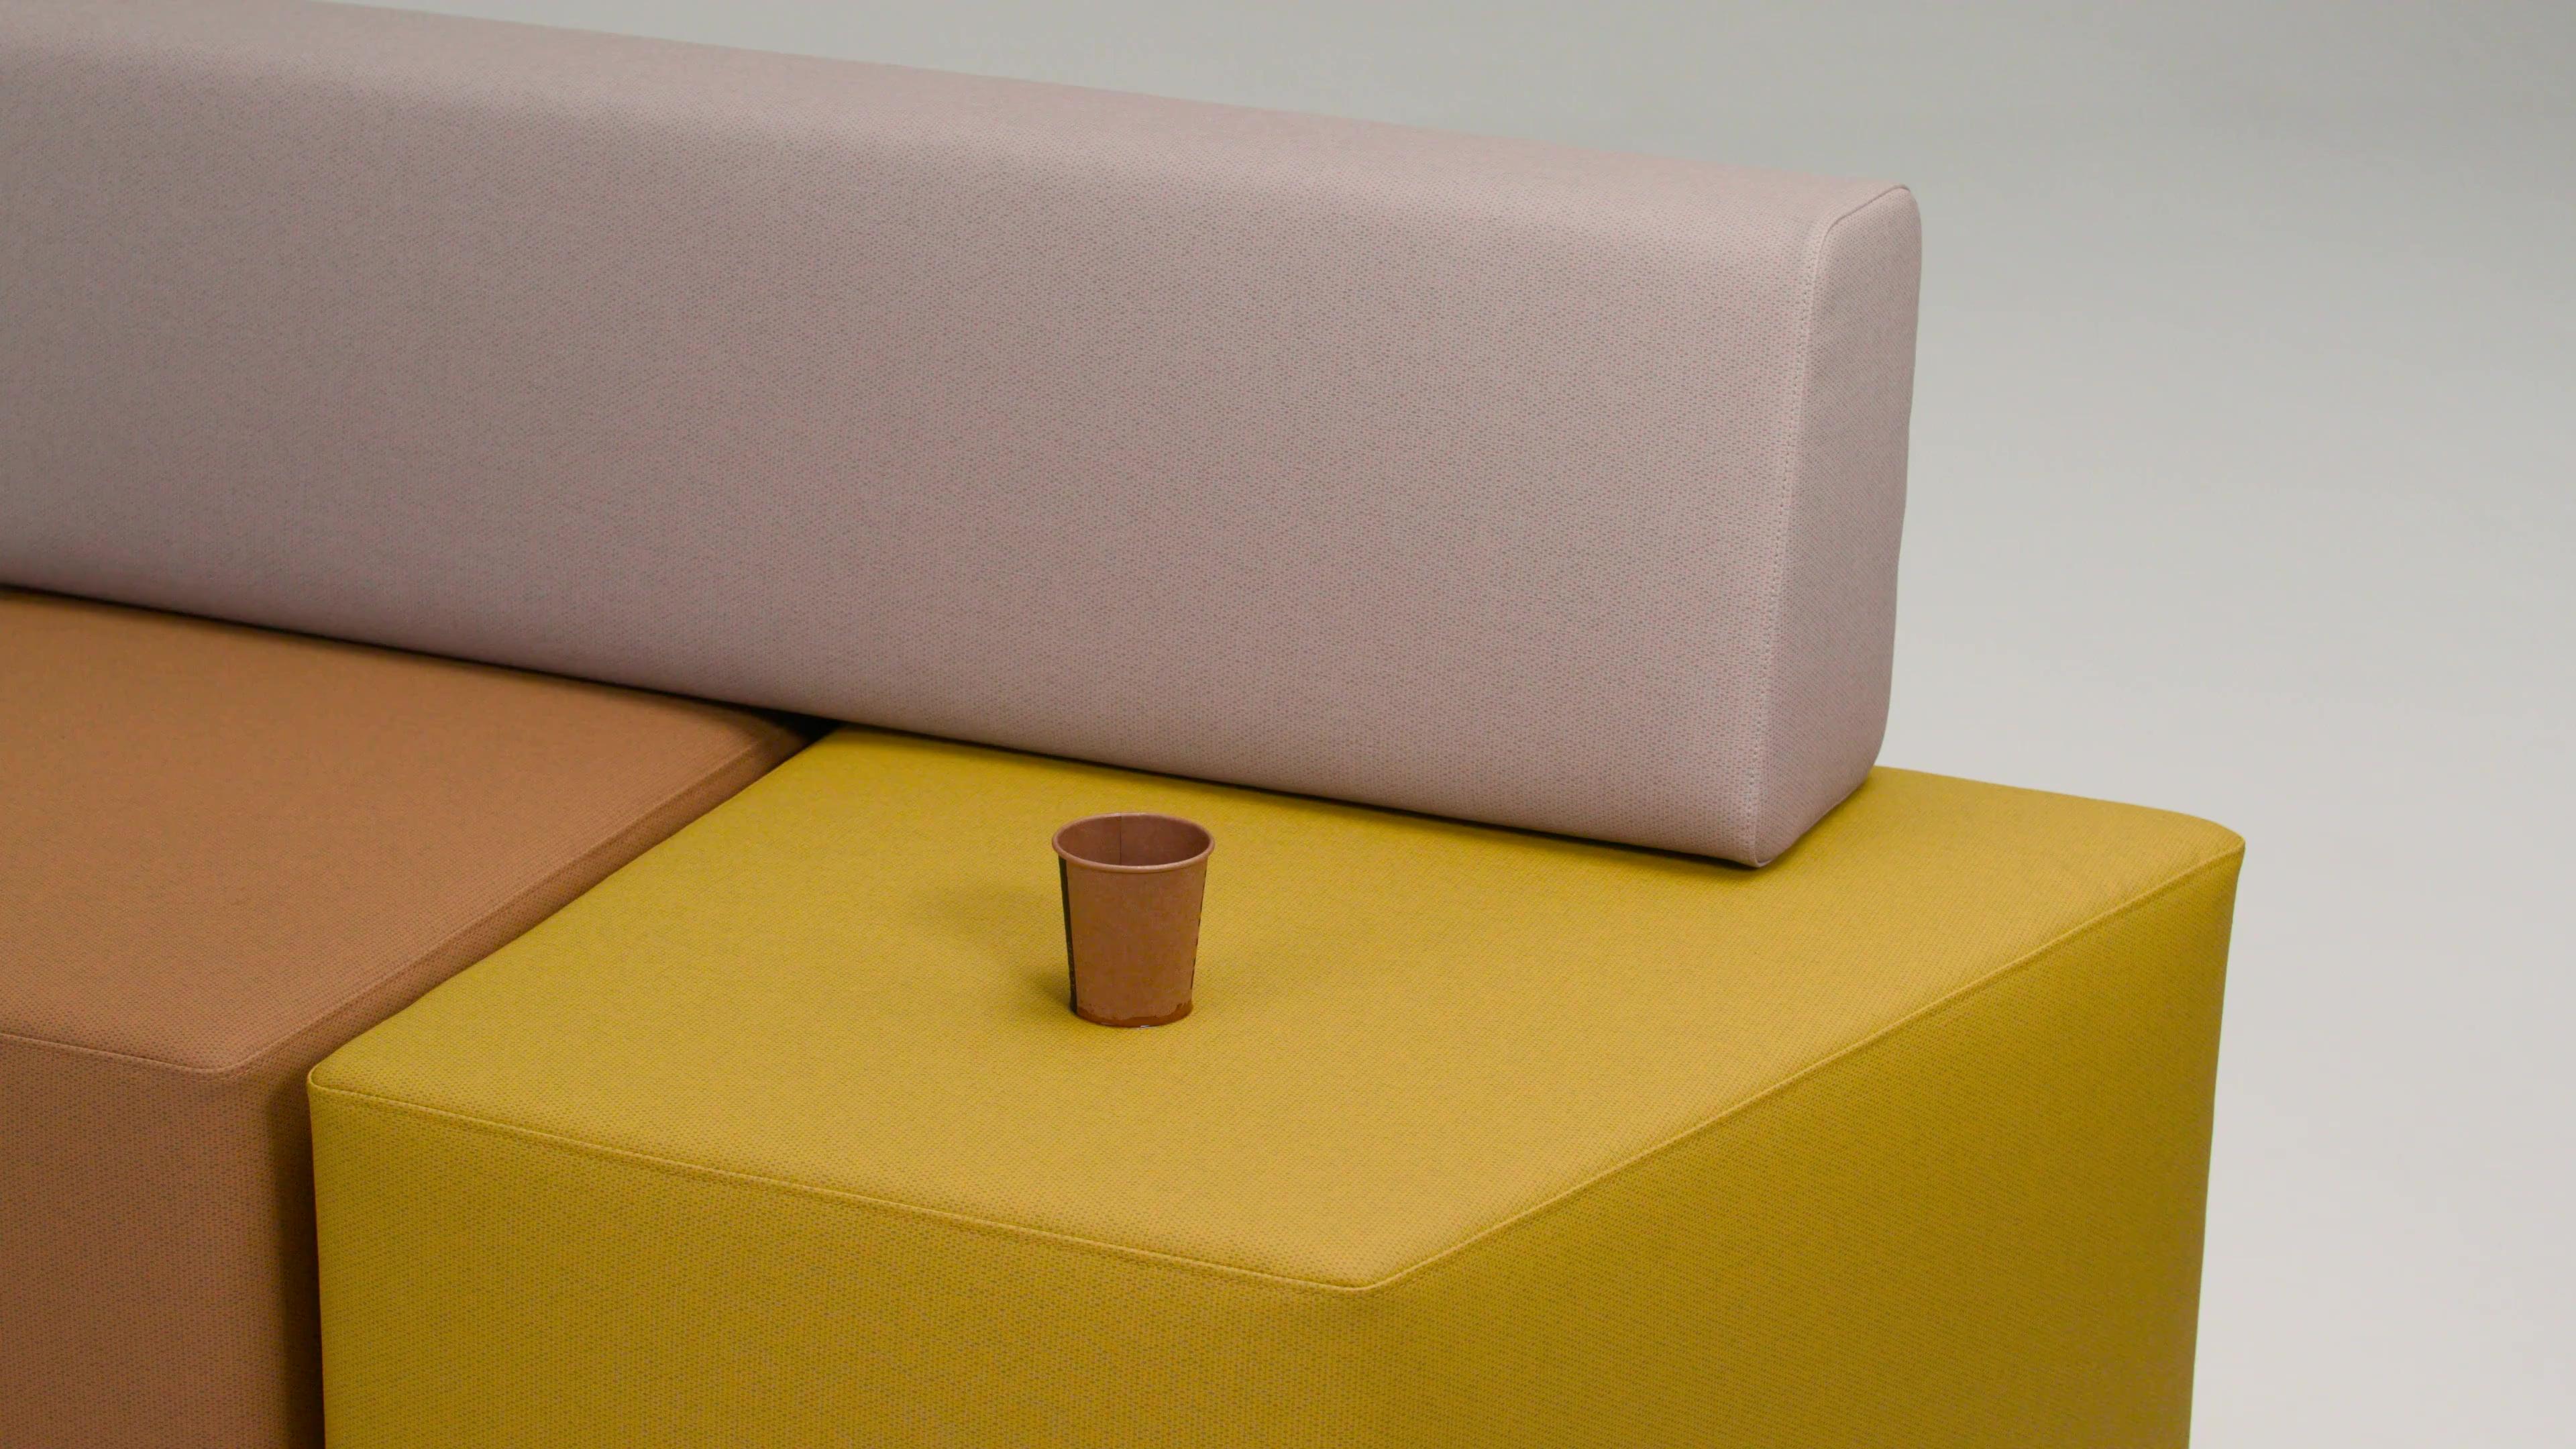 Video vinyl meubelbekleding - eenvoudige reiniging (koffie)-1